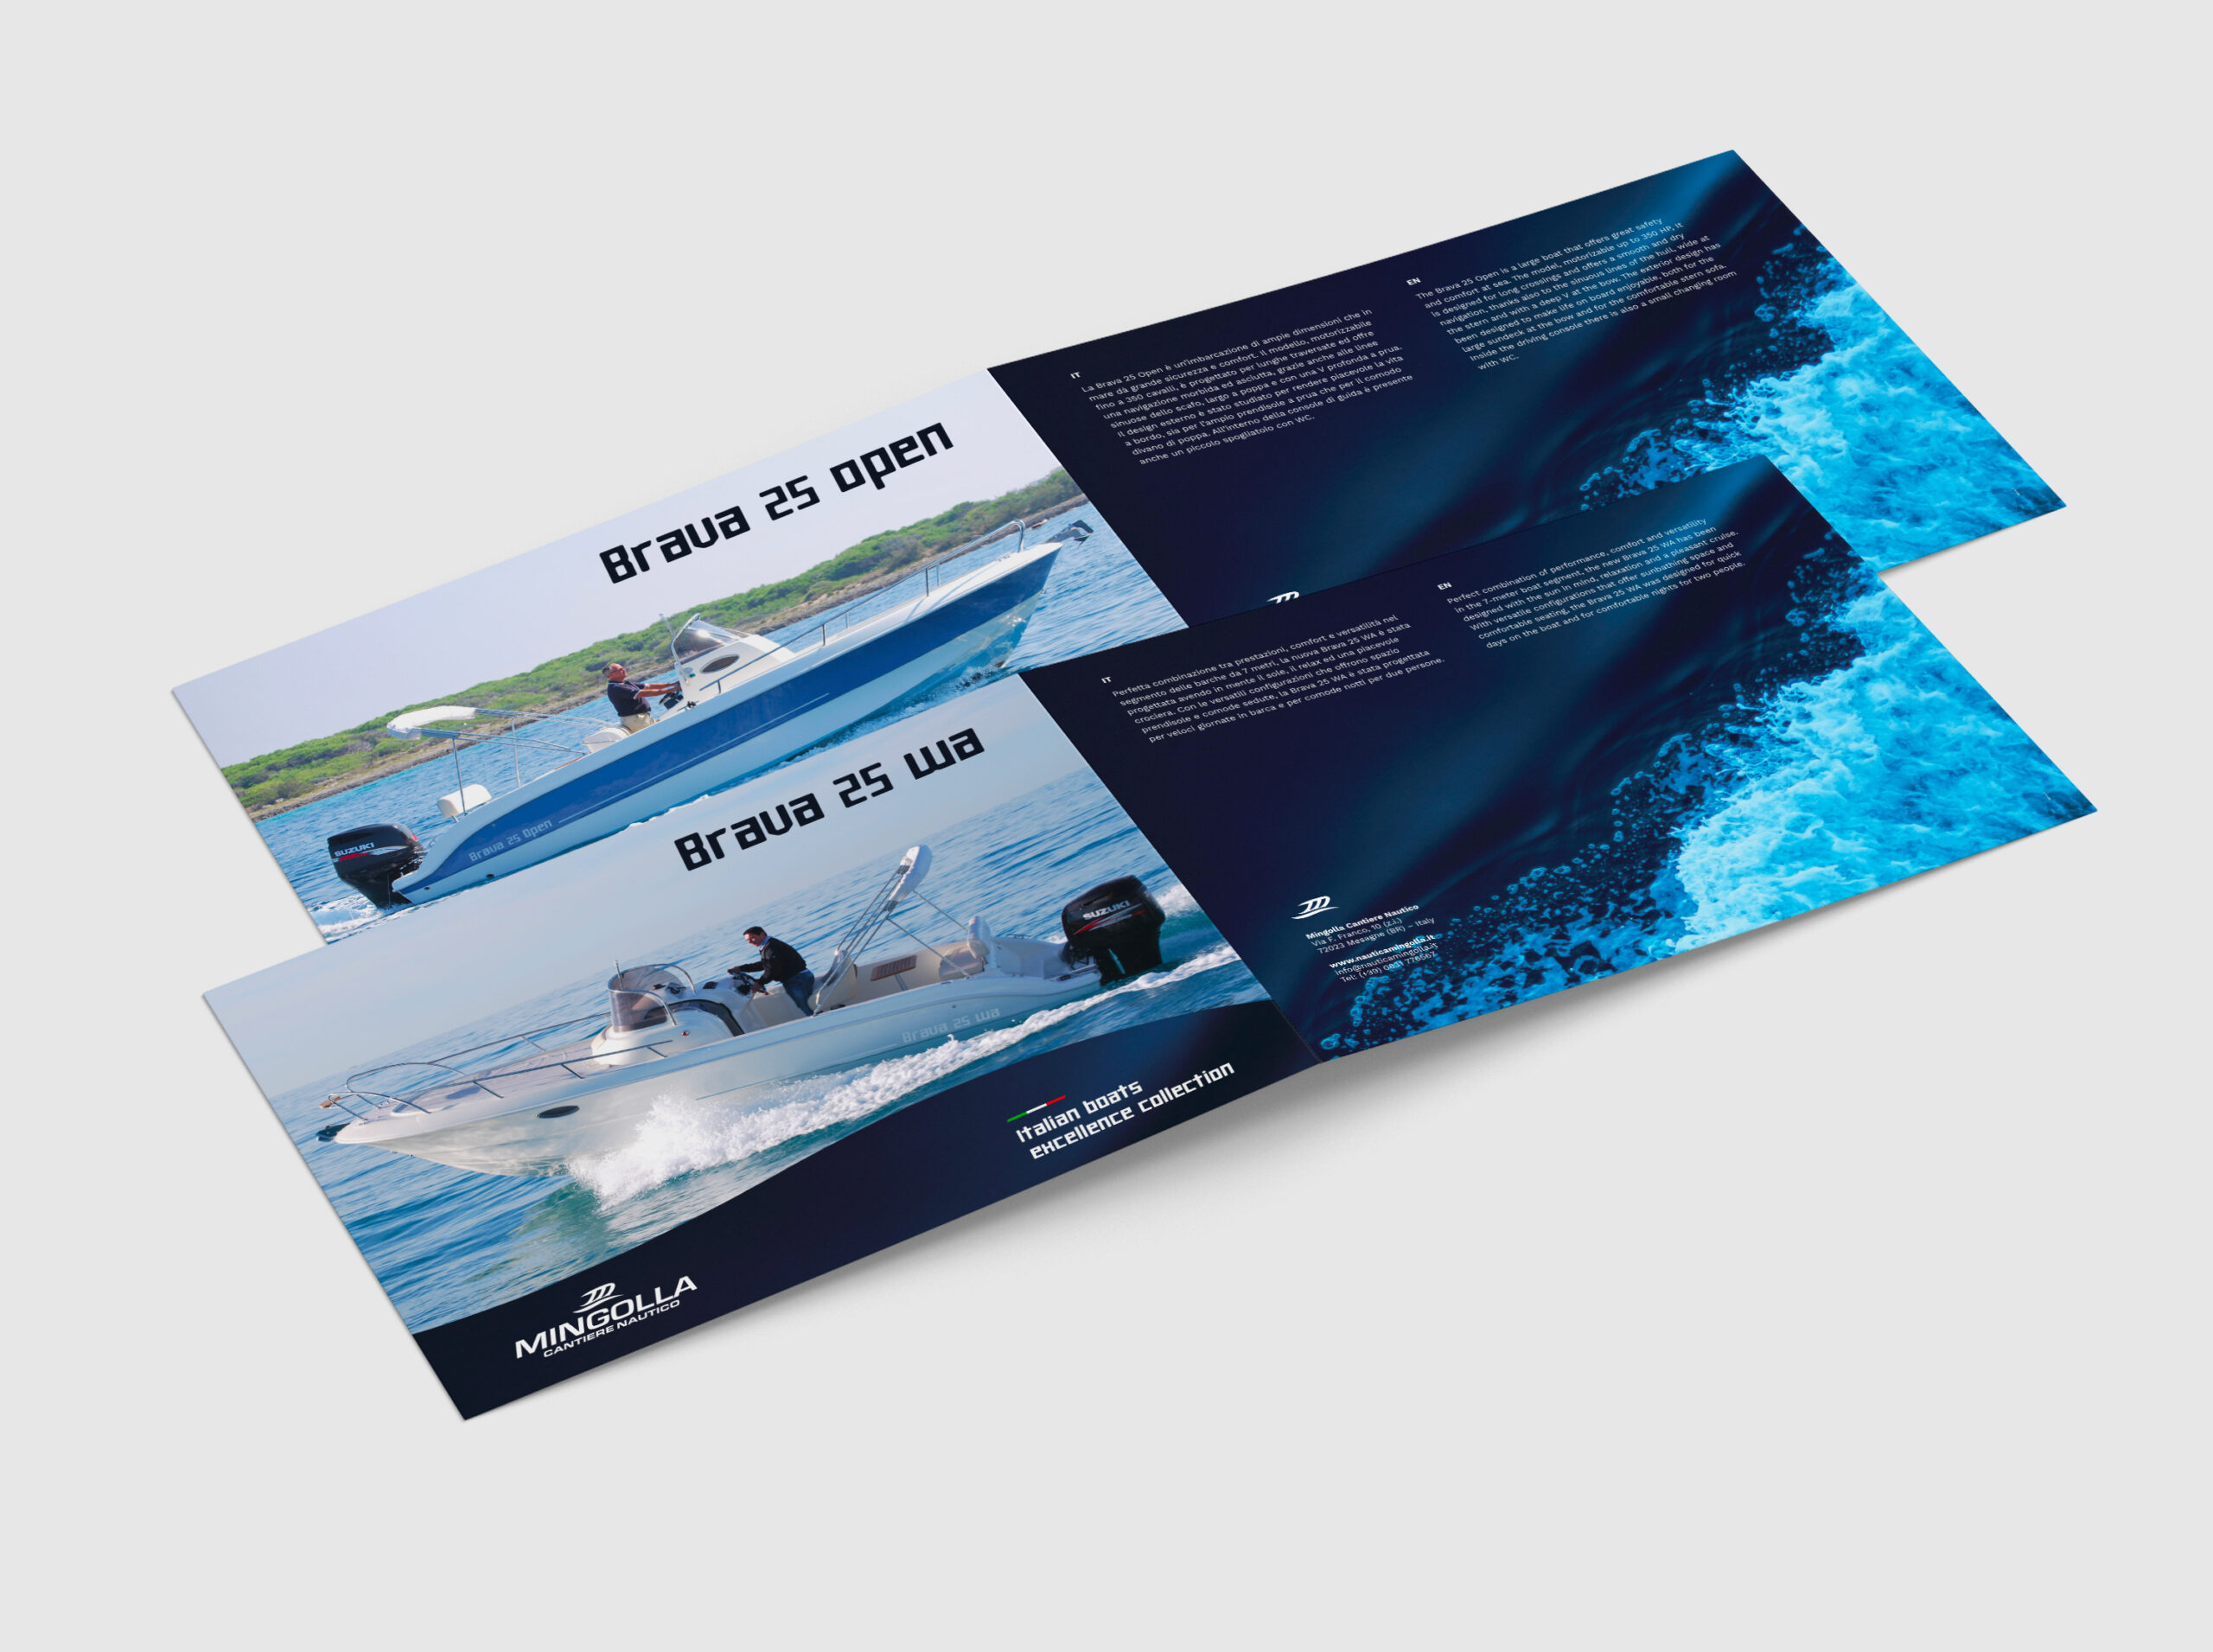 Nautica Mingolla - digital, web, print - img 6